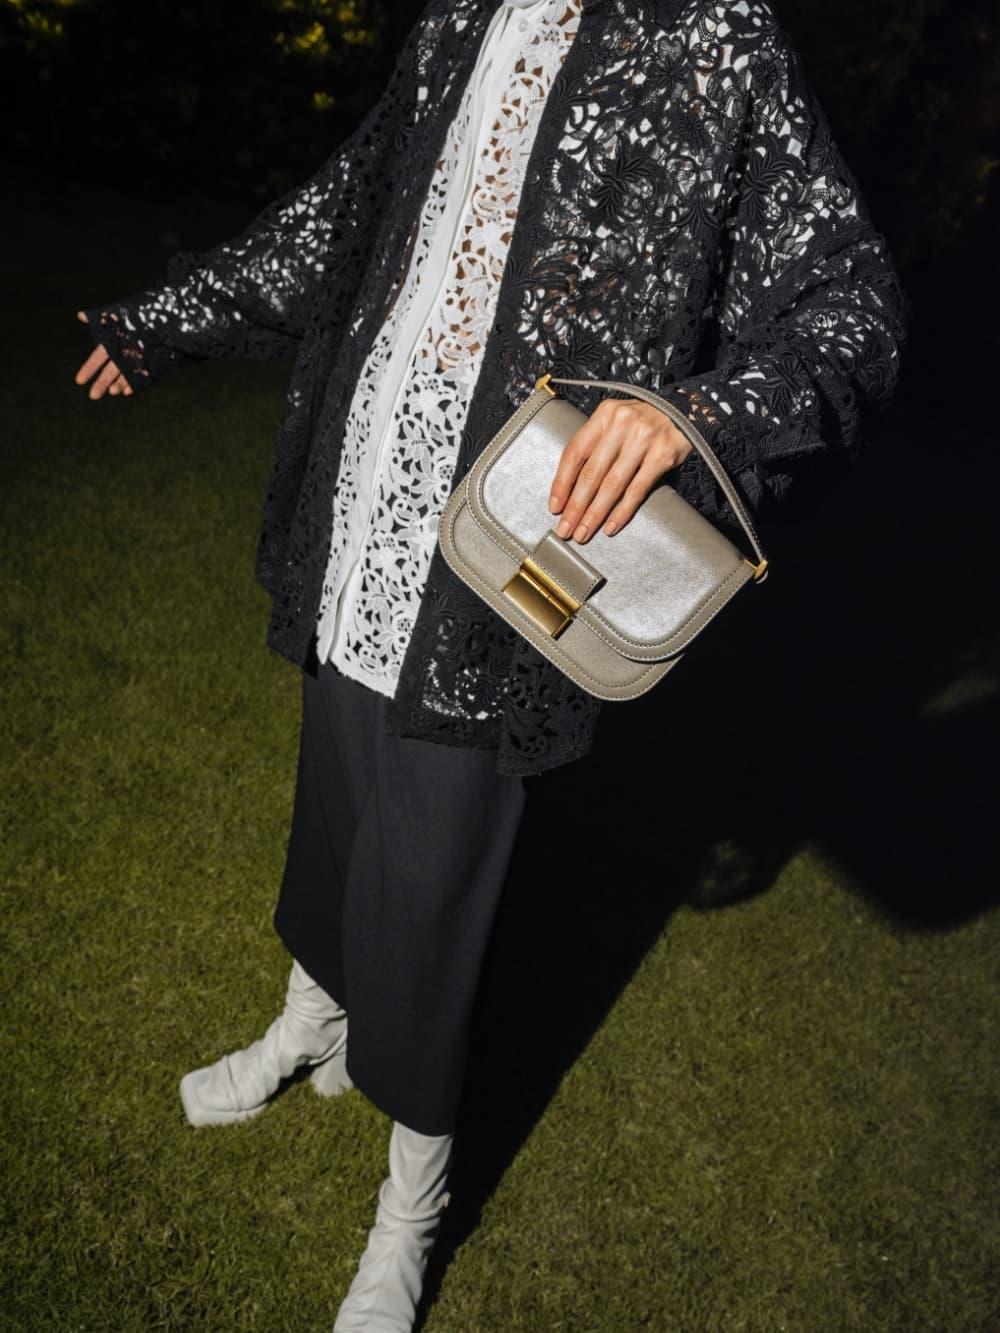 Women's ivory Charlot crossbody bag, as seen on South Korean actress Ki Eun Se - CHARLES & KEITH